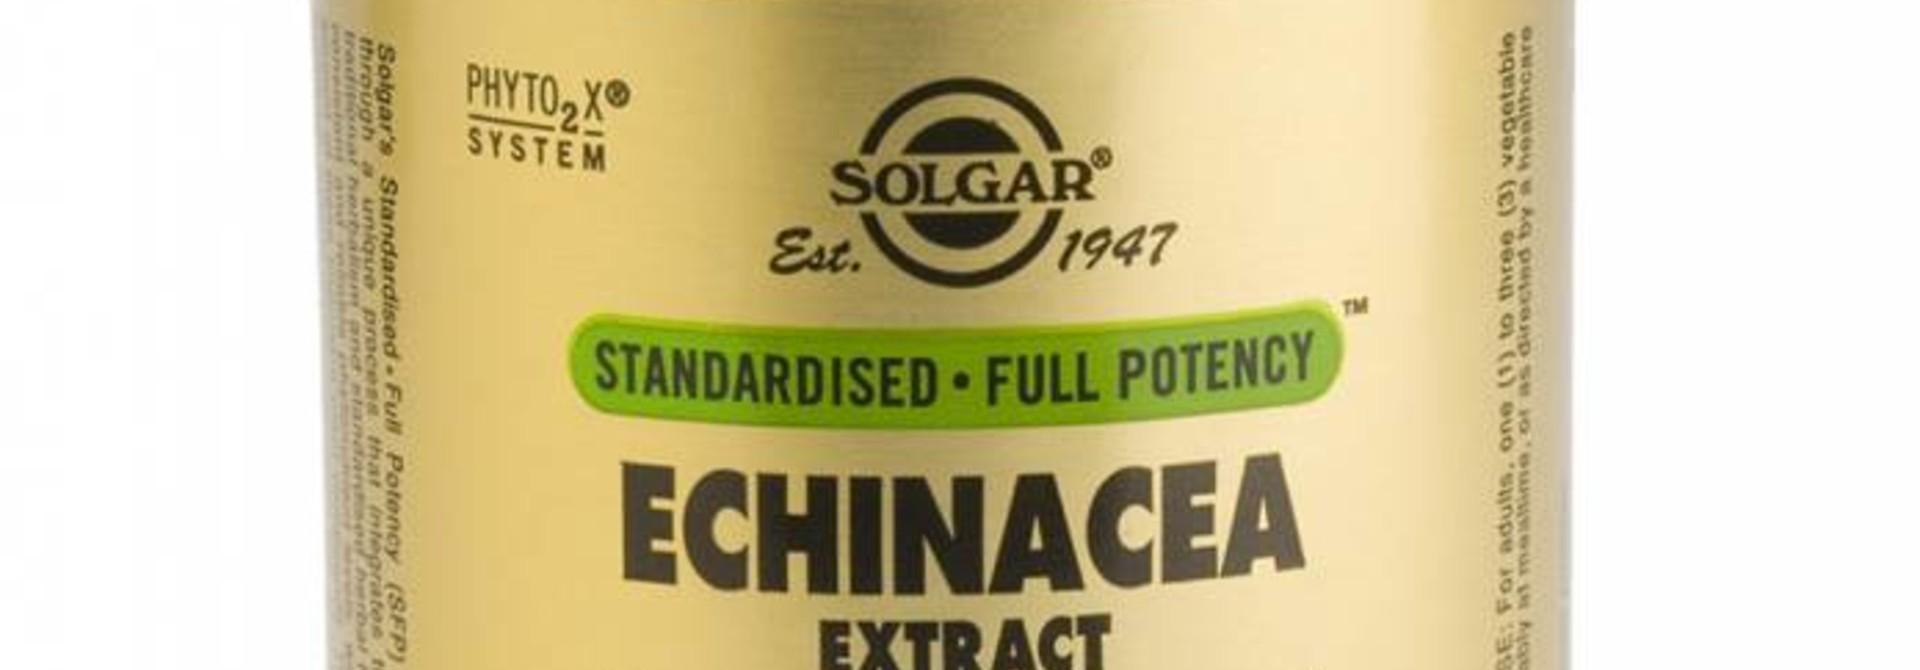 Echinacea Extract 60 plantaardige capsules